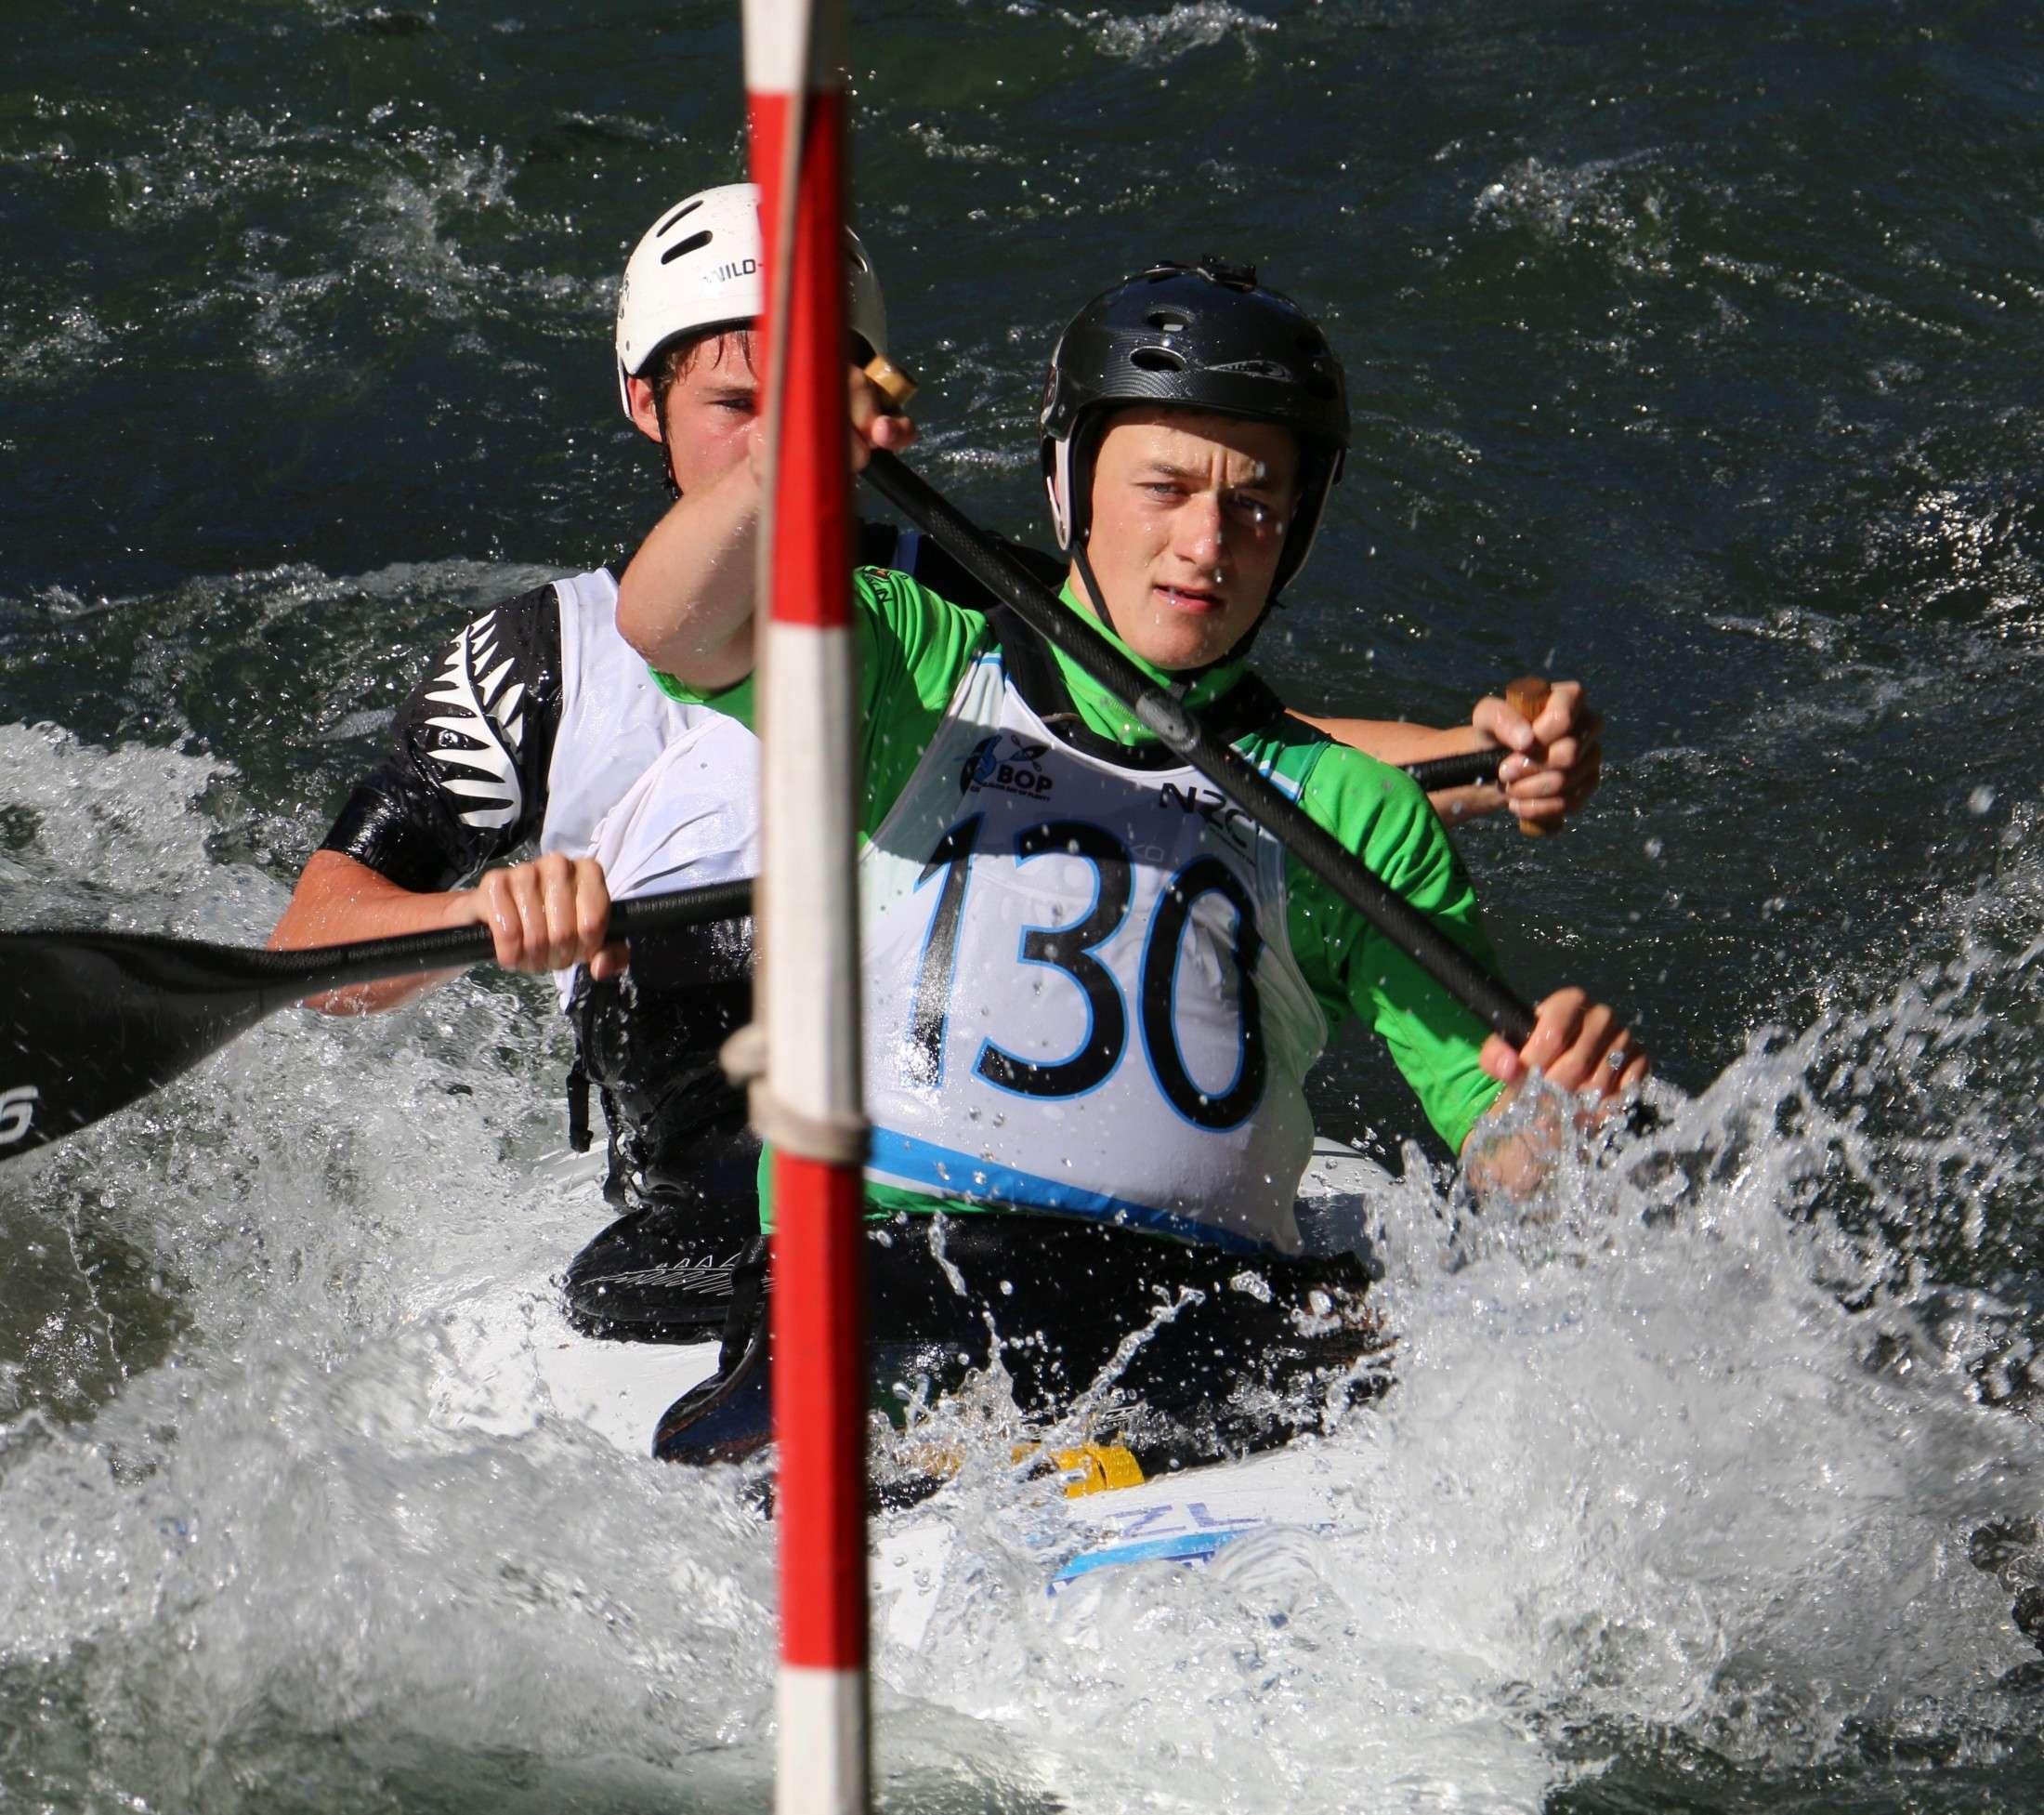 Canoe Slalom - How to get involved - Titans Sports  -  Tauranga Boys' College